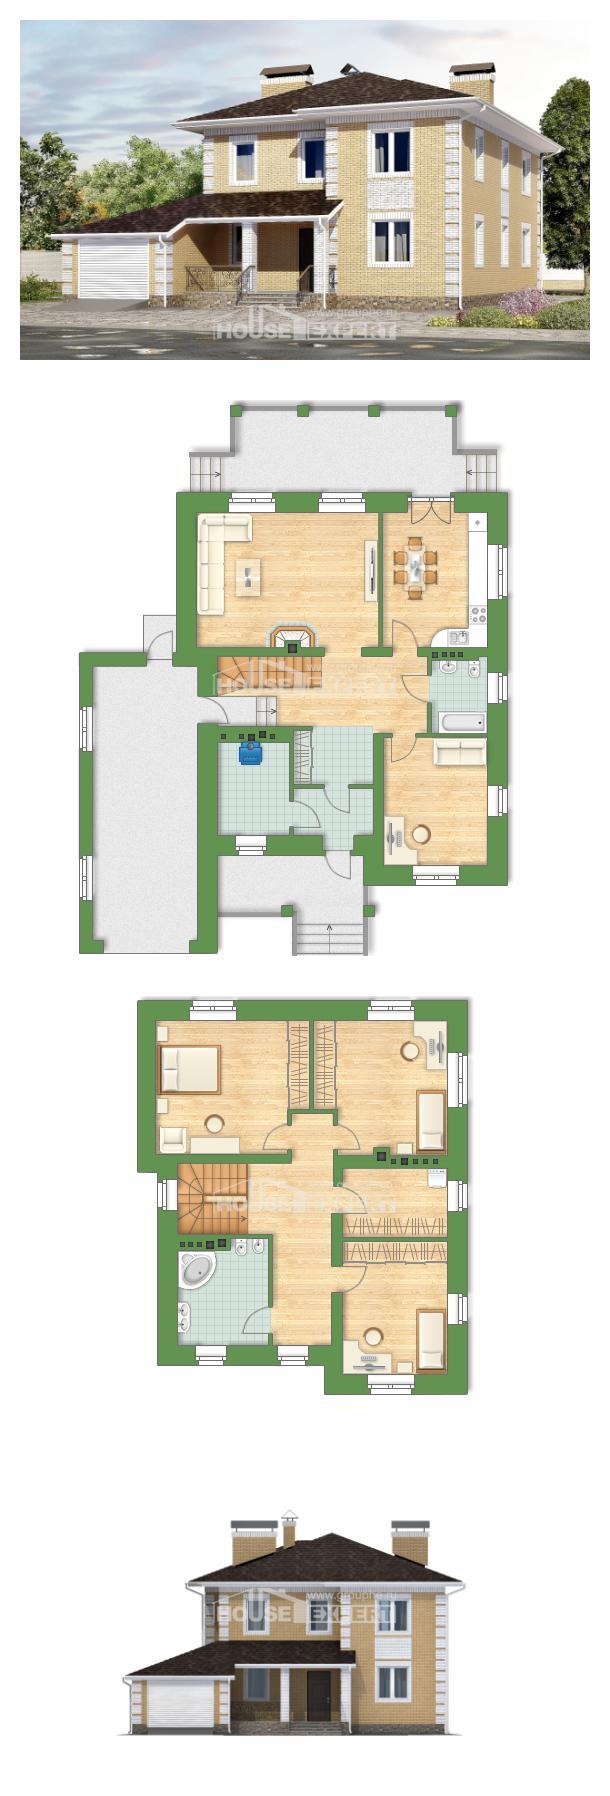 Proyecto de casa 220-006-L | House Expert